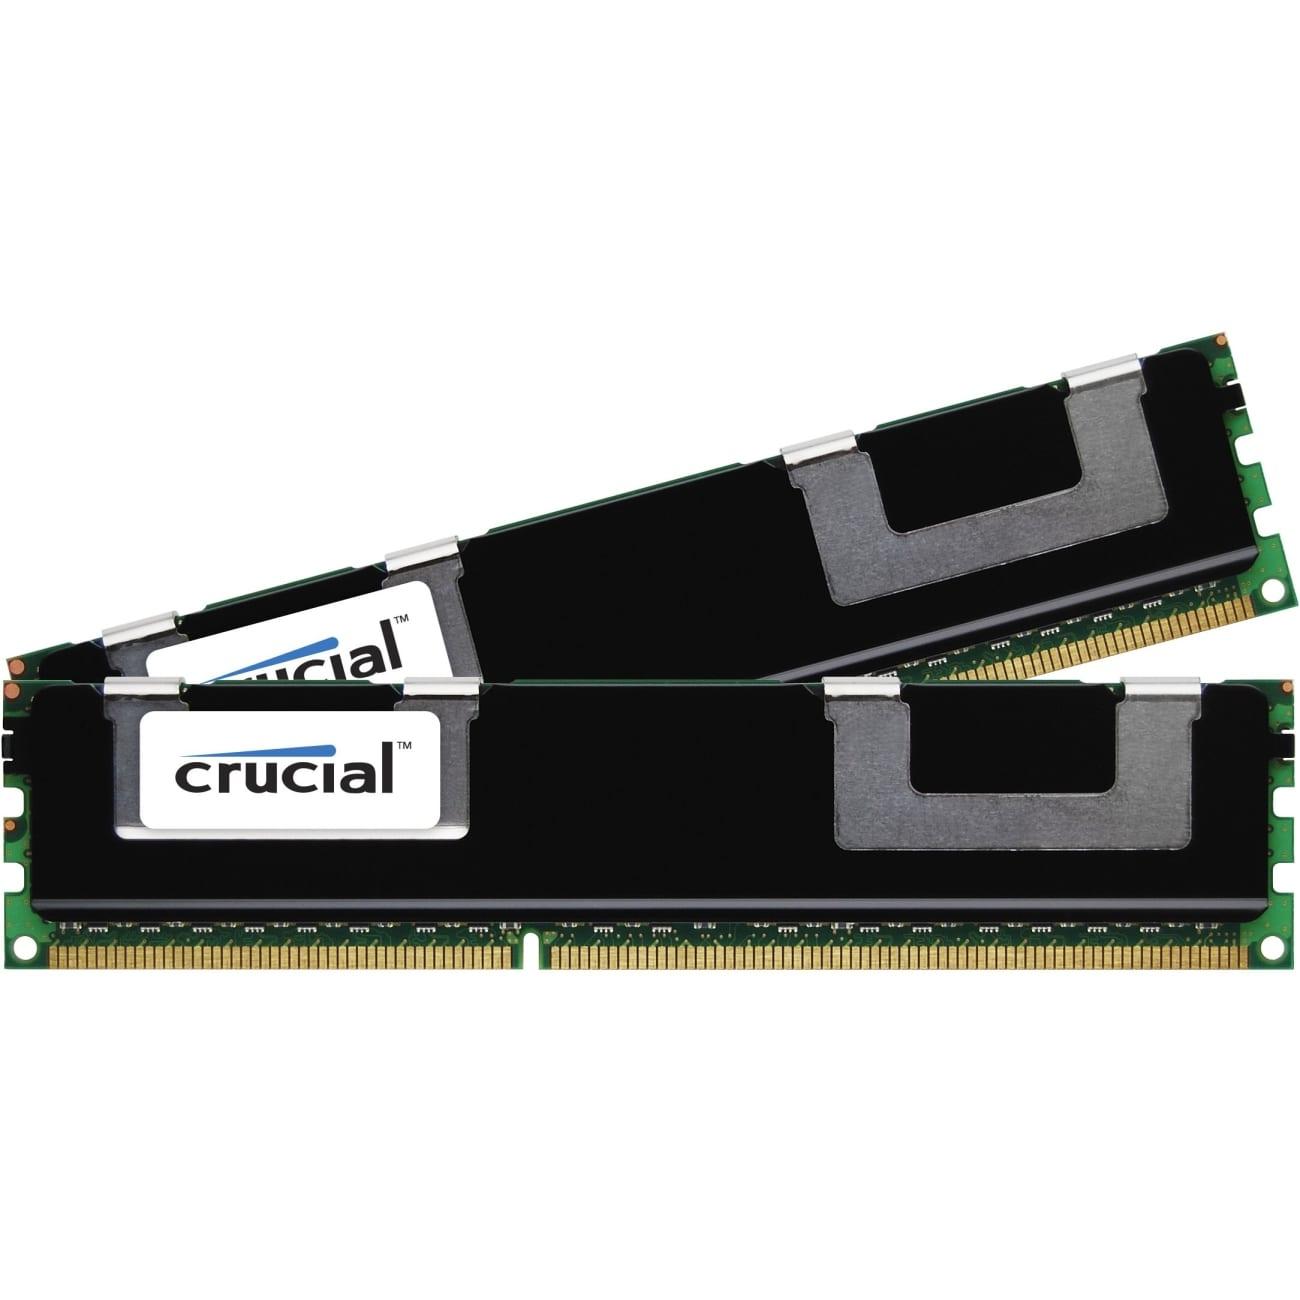 Crucial 16GB kit (2x8GB) 1866MHz DDR RDIMM Memory